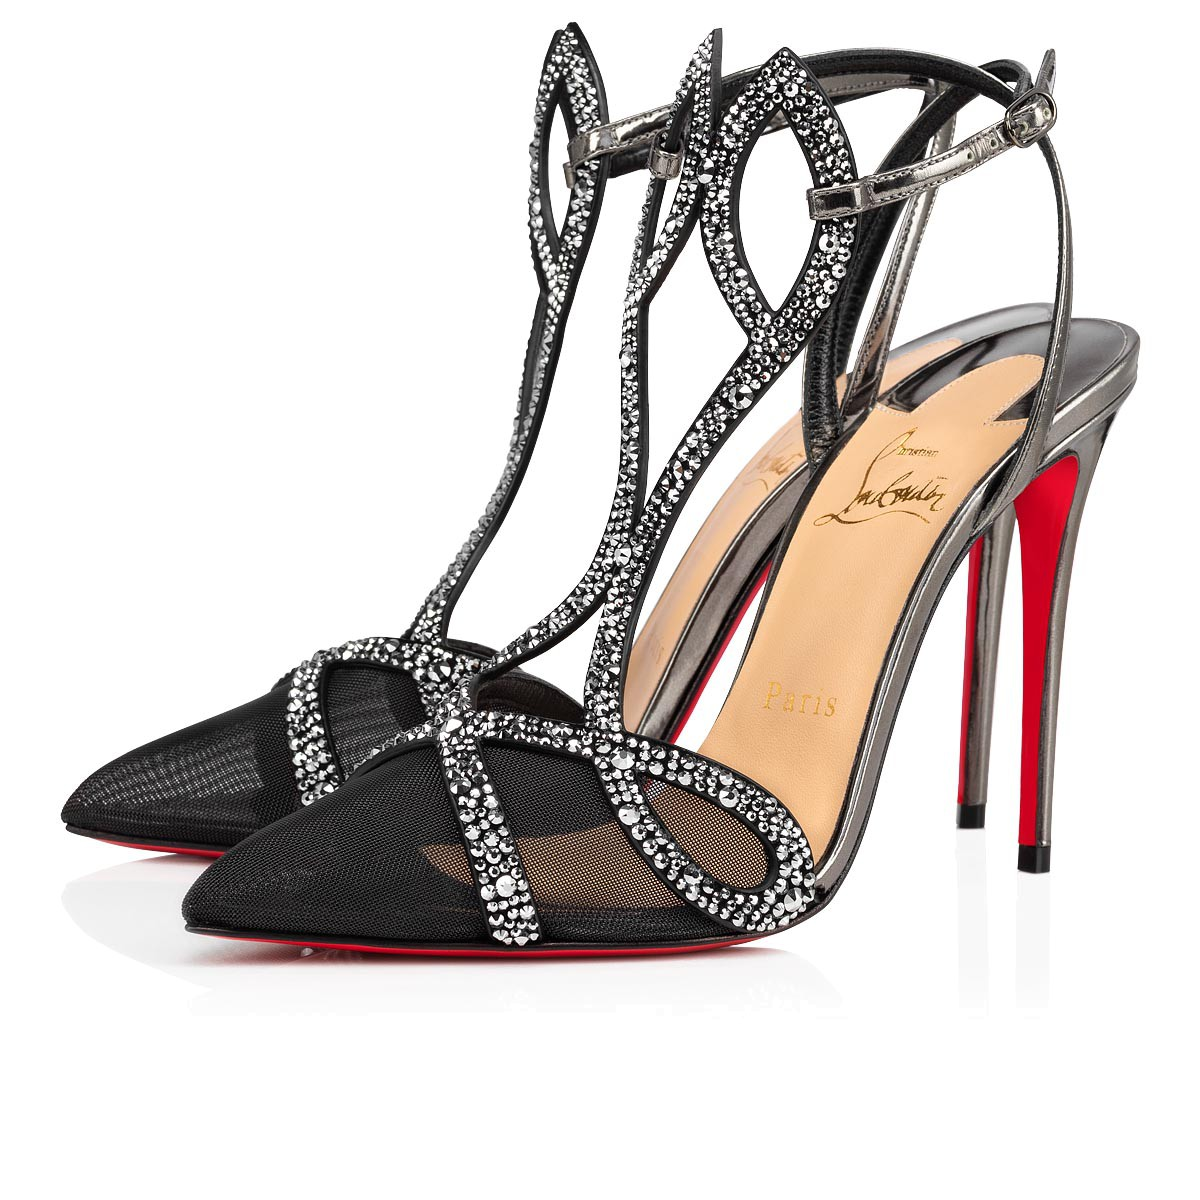 Shoes - Double L Pump Strass - Christian Louboutin